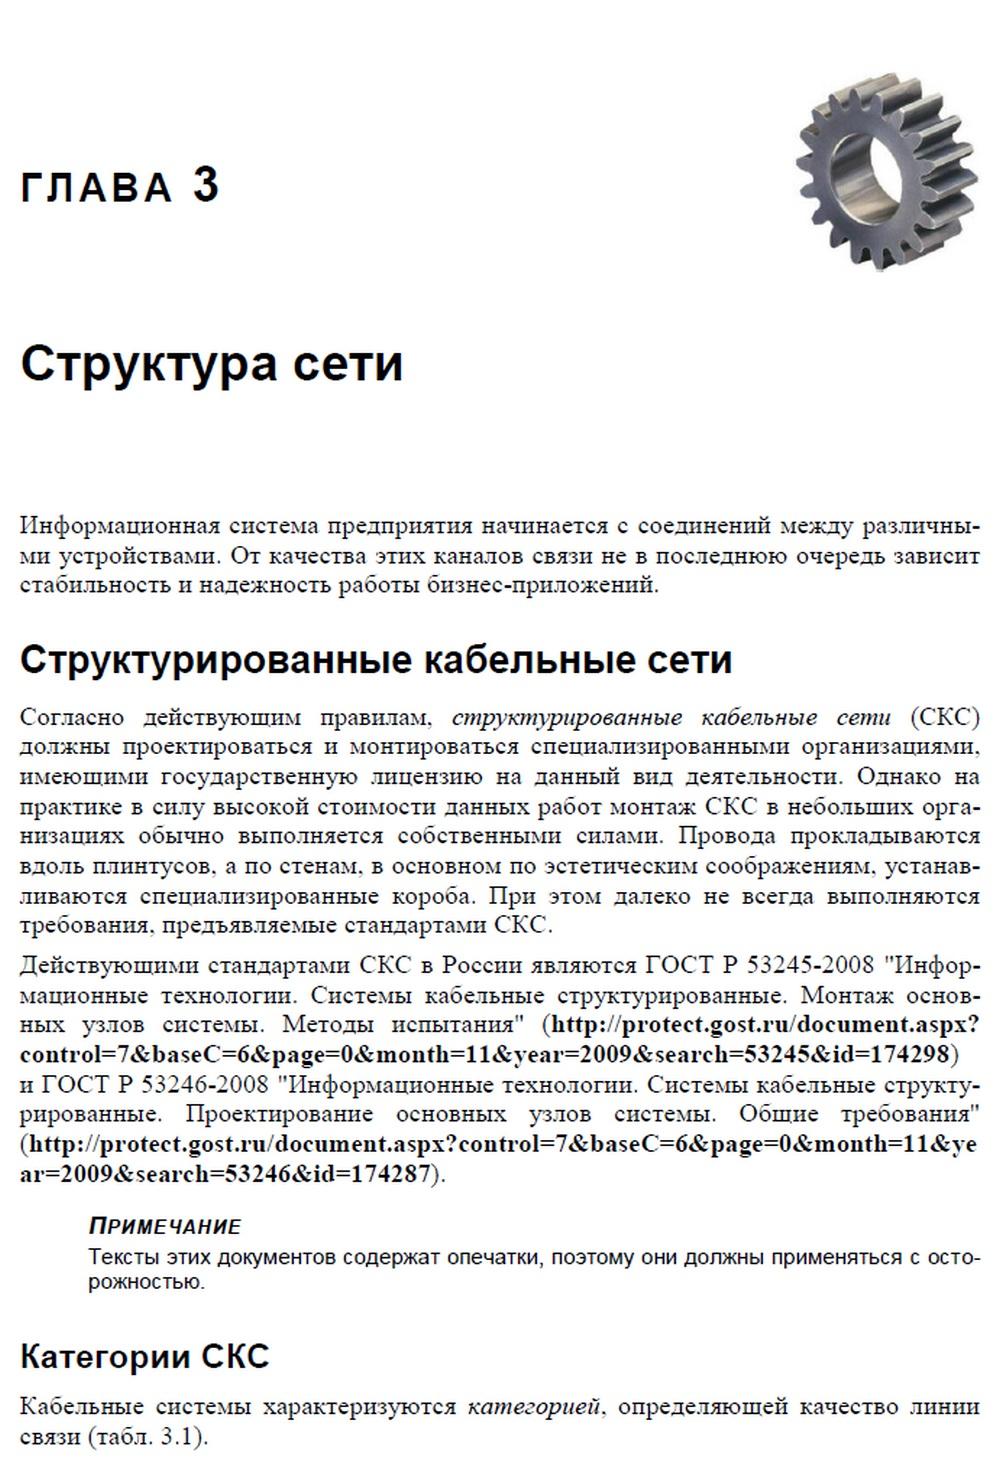 http://i5.imageban.ru/out/2013/11/20/0de05b39404f12ddb7962f3f75a01ac6.jpg